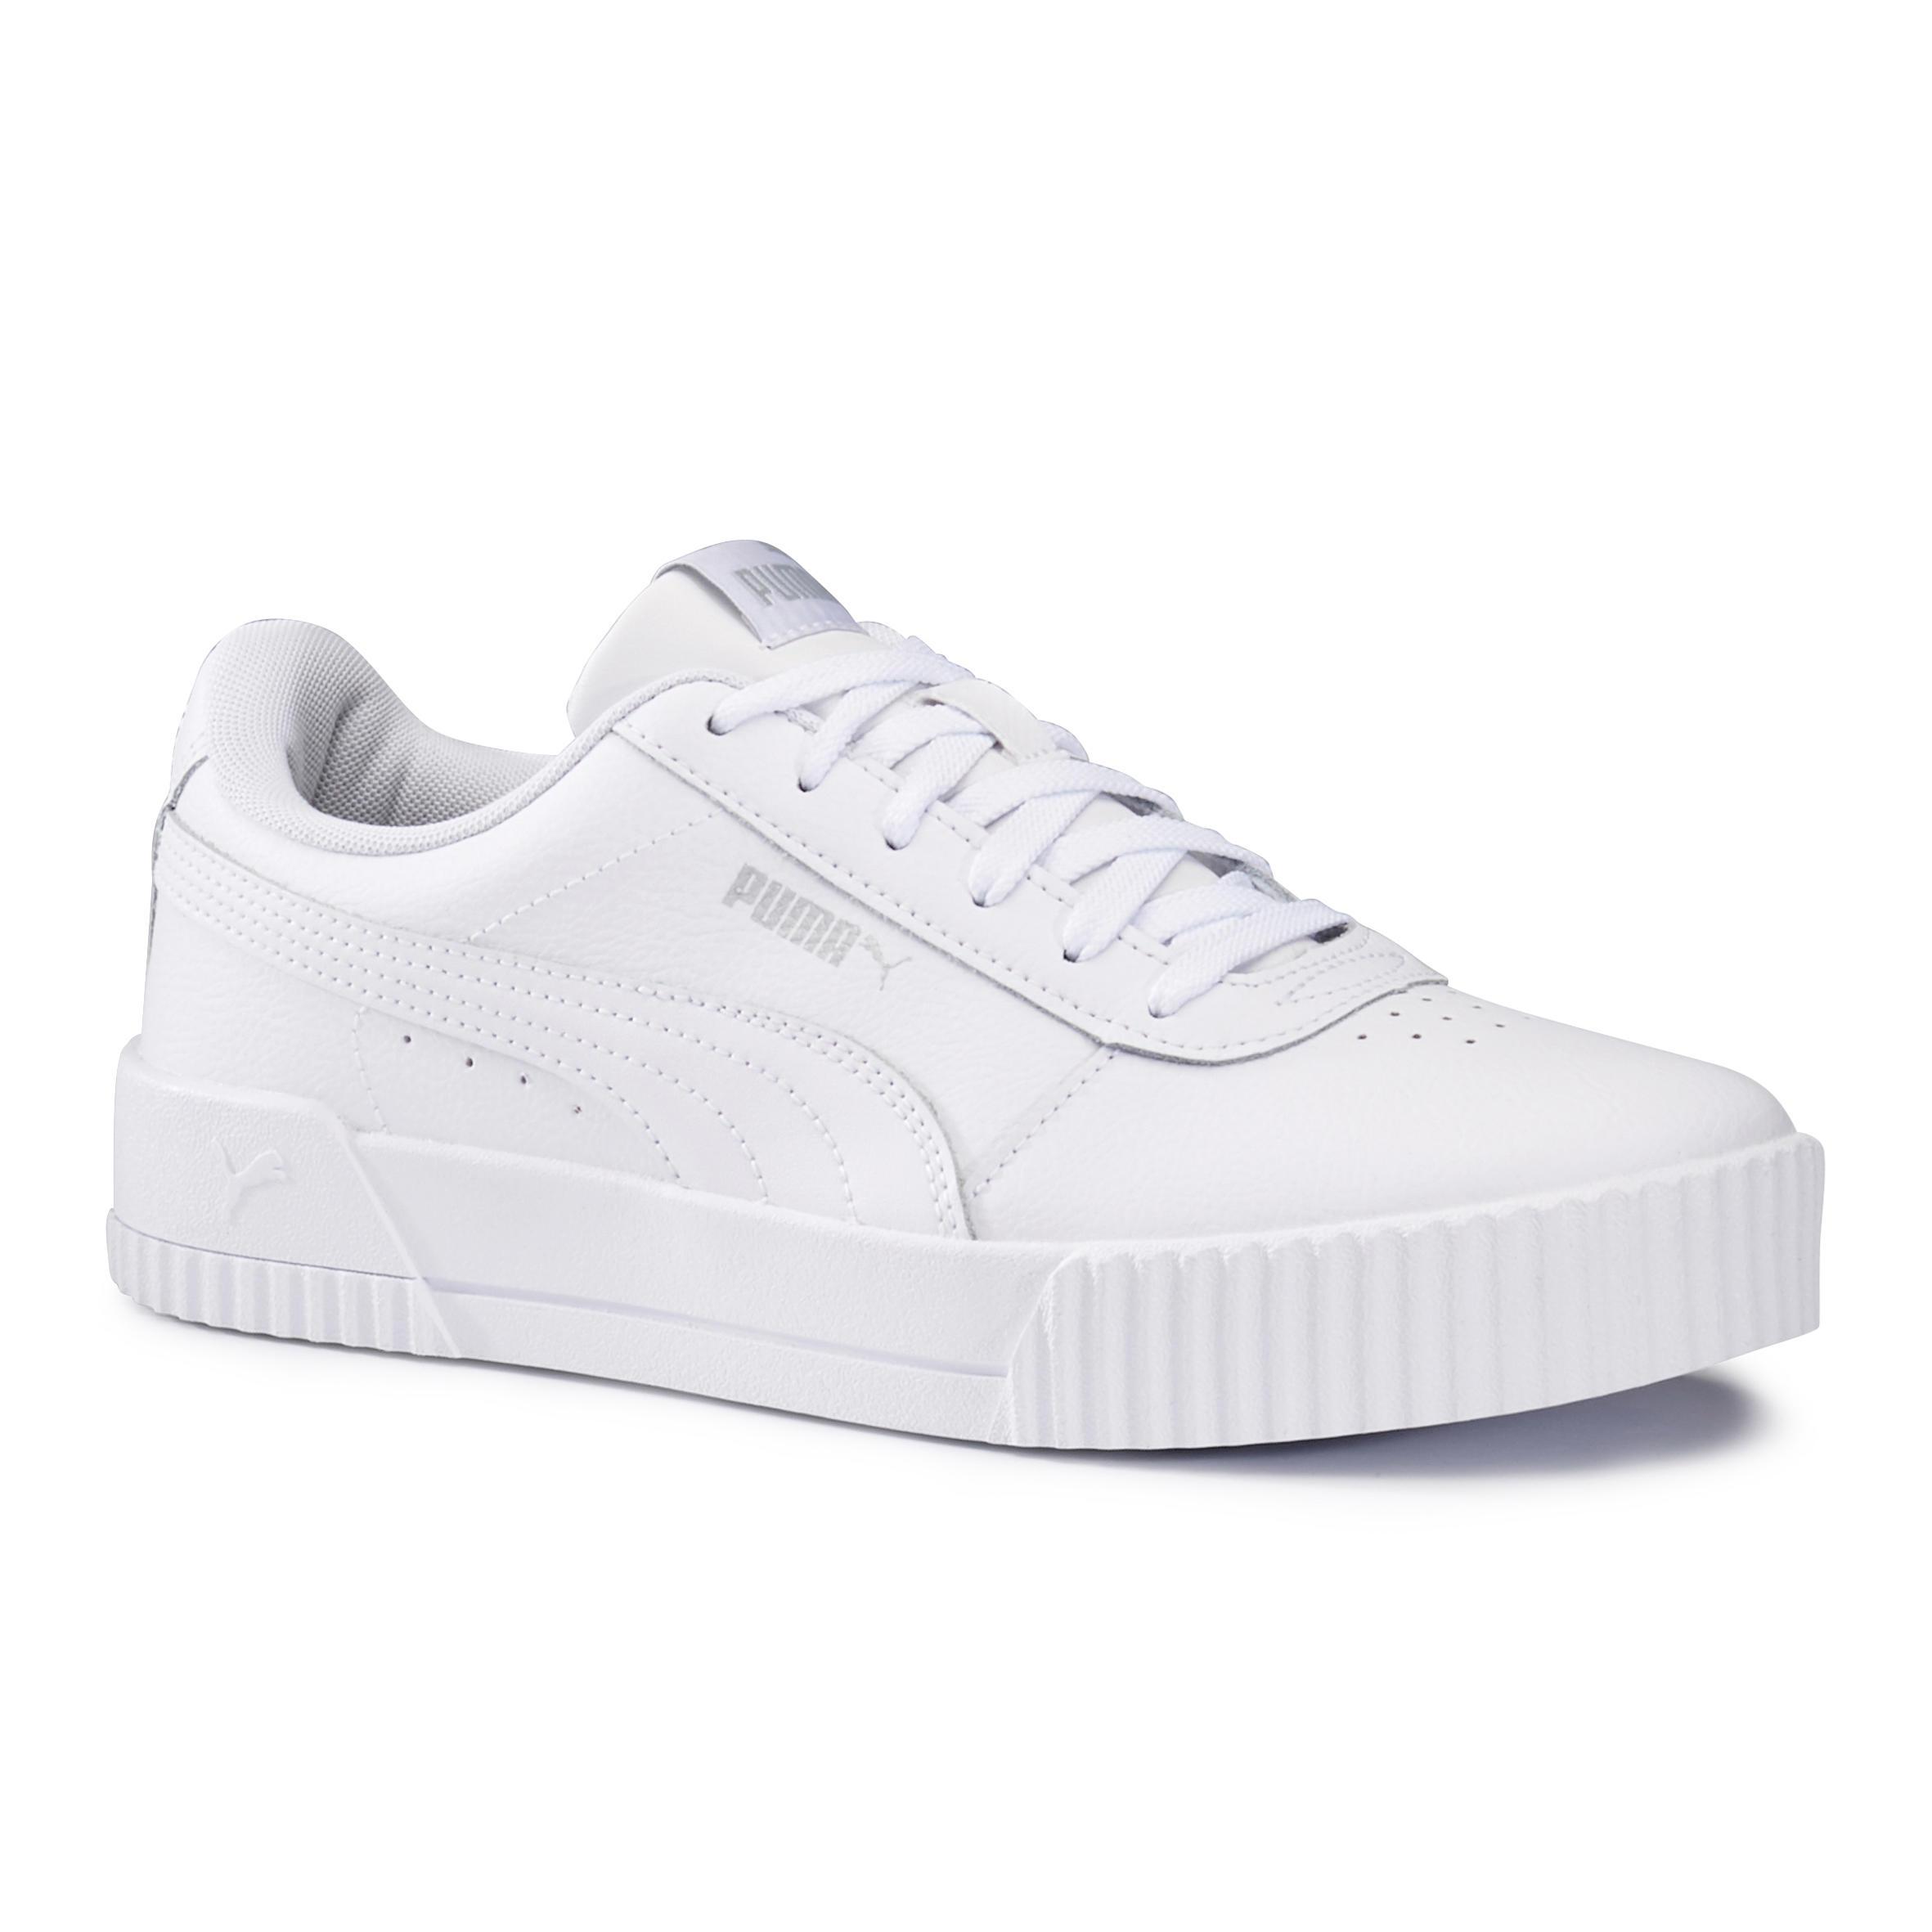 Chaussures femme Puma | Decathlon